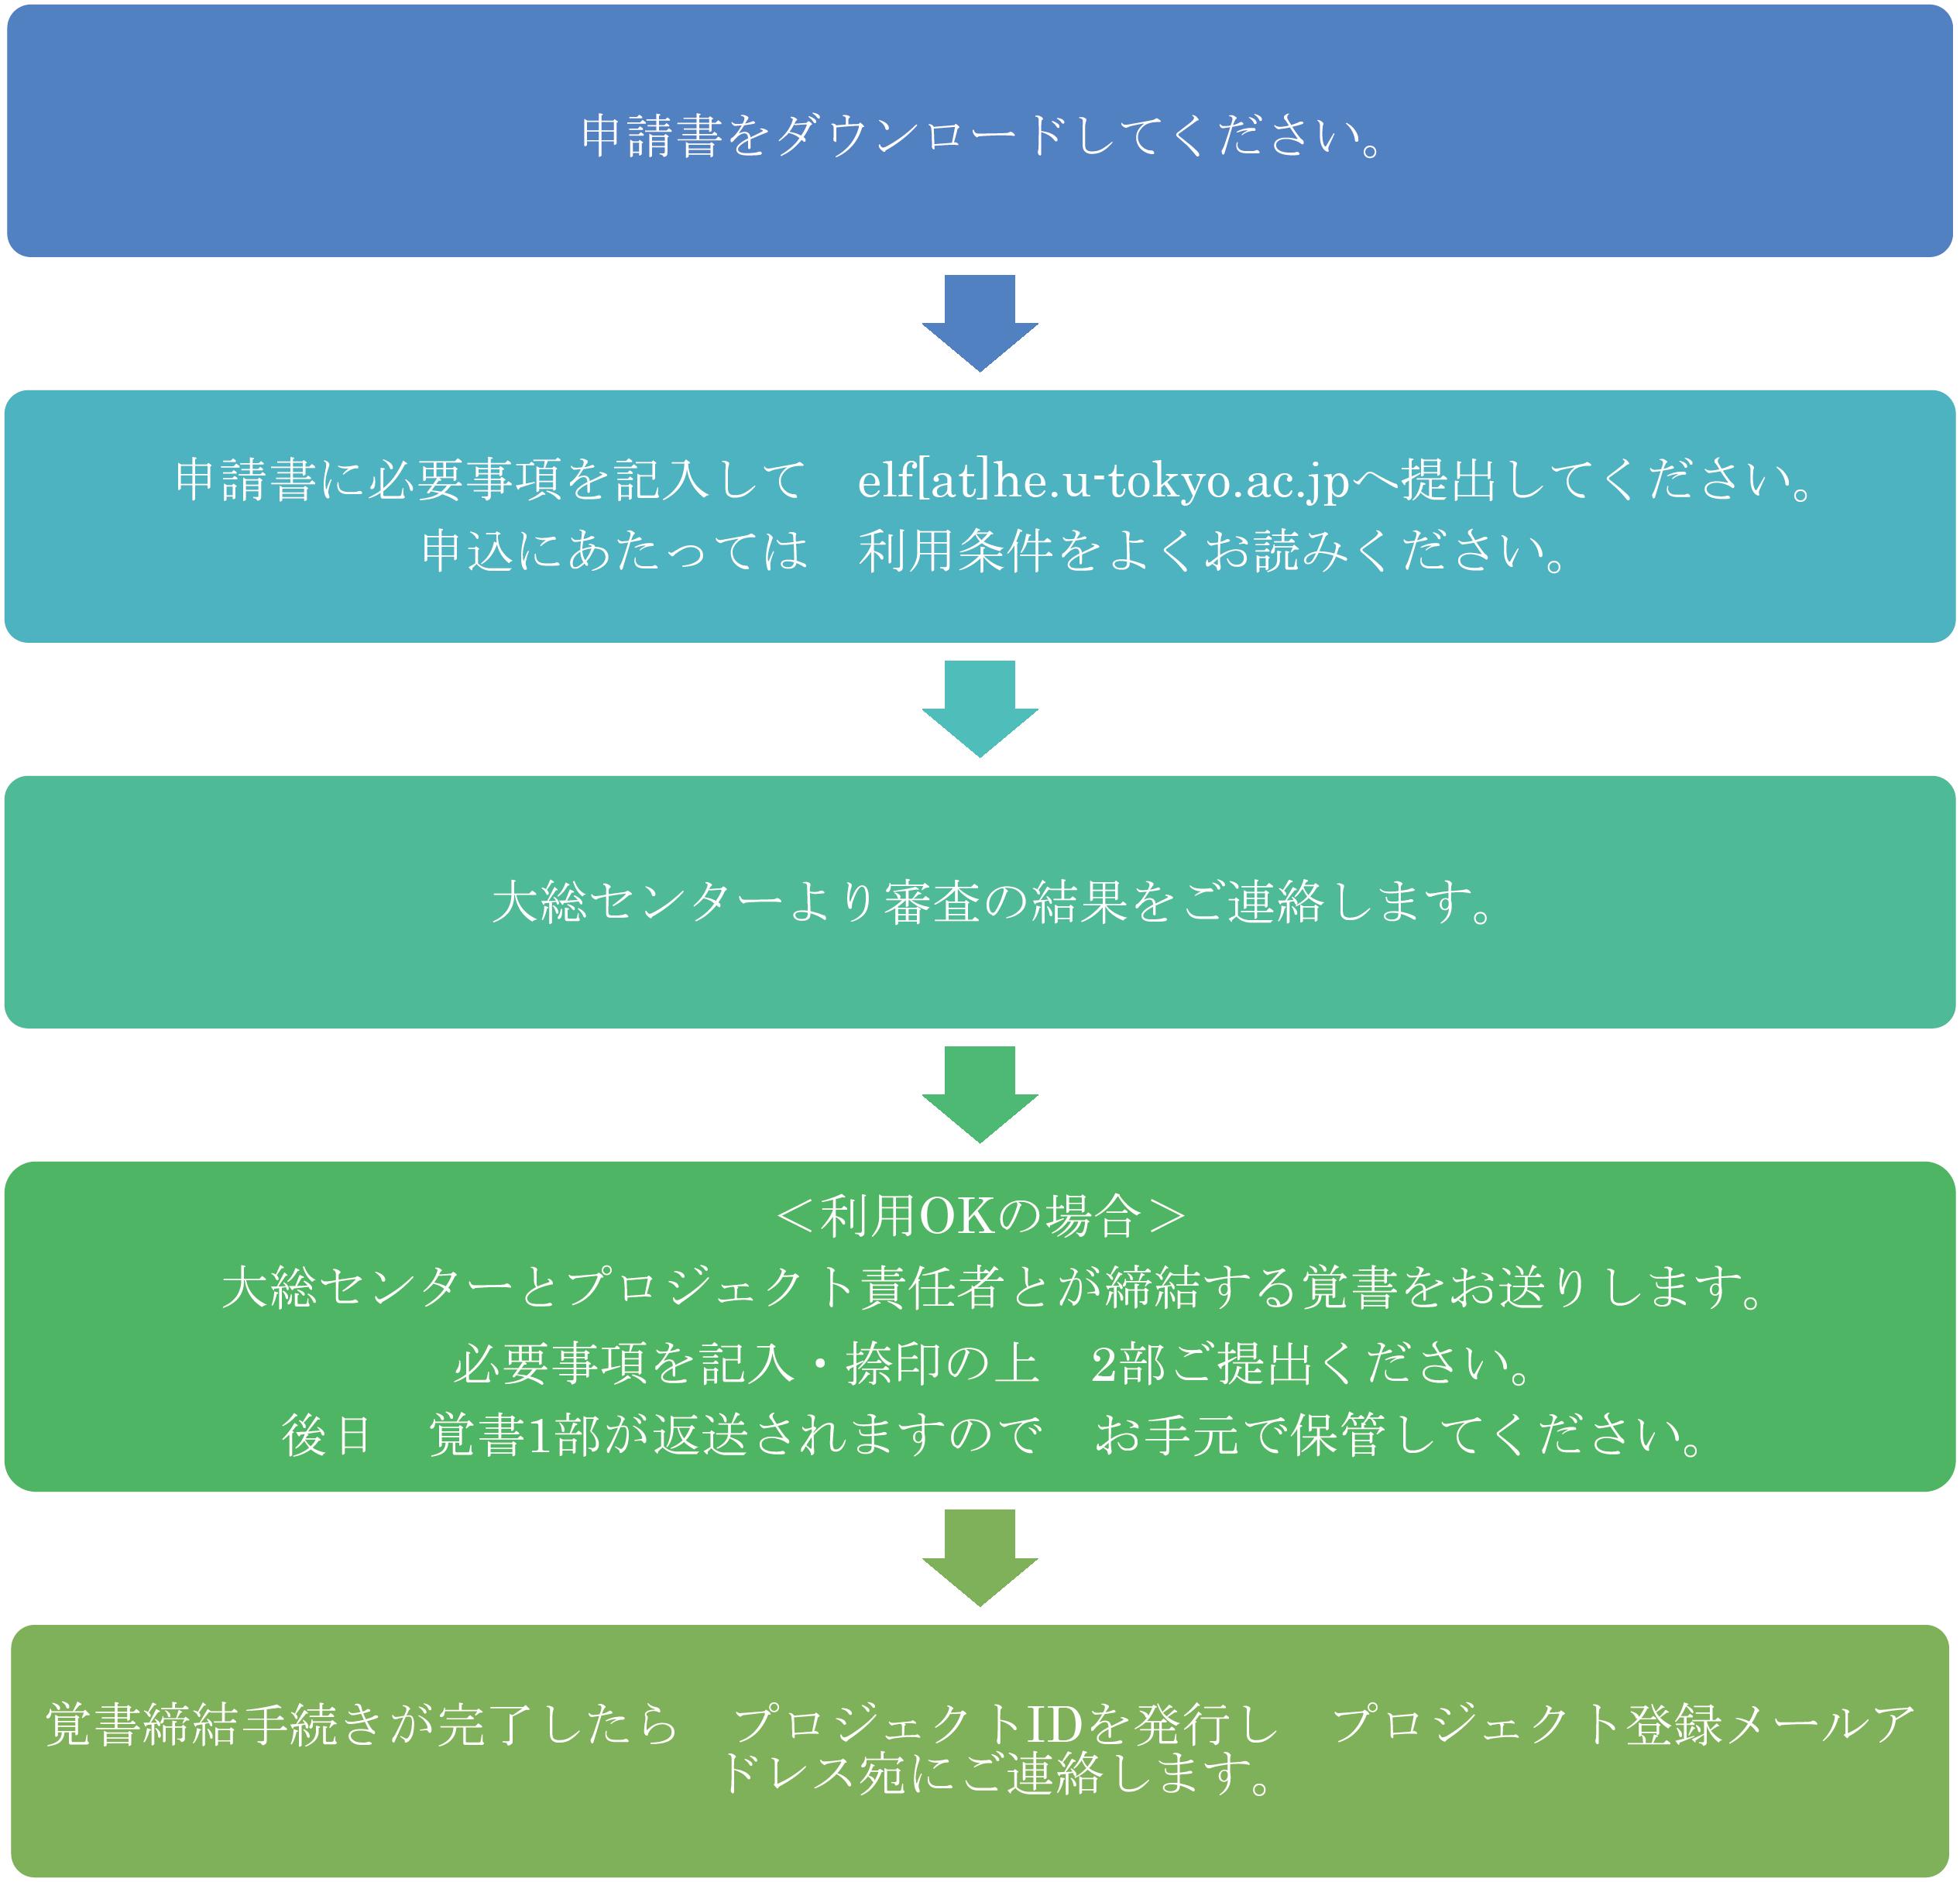 utokyo_elf-project_admin_user_id